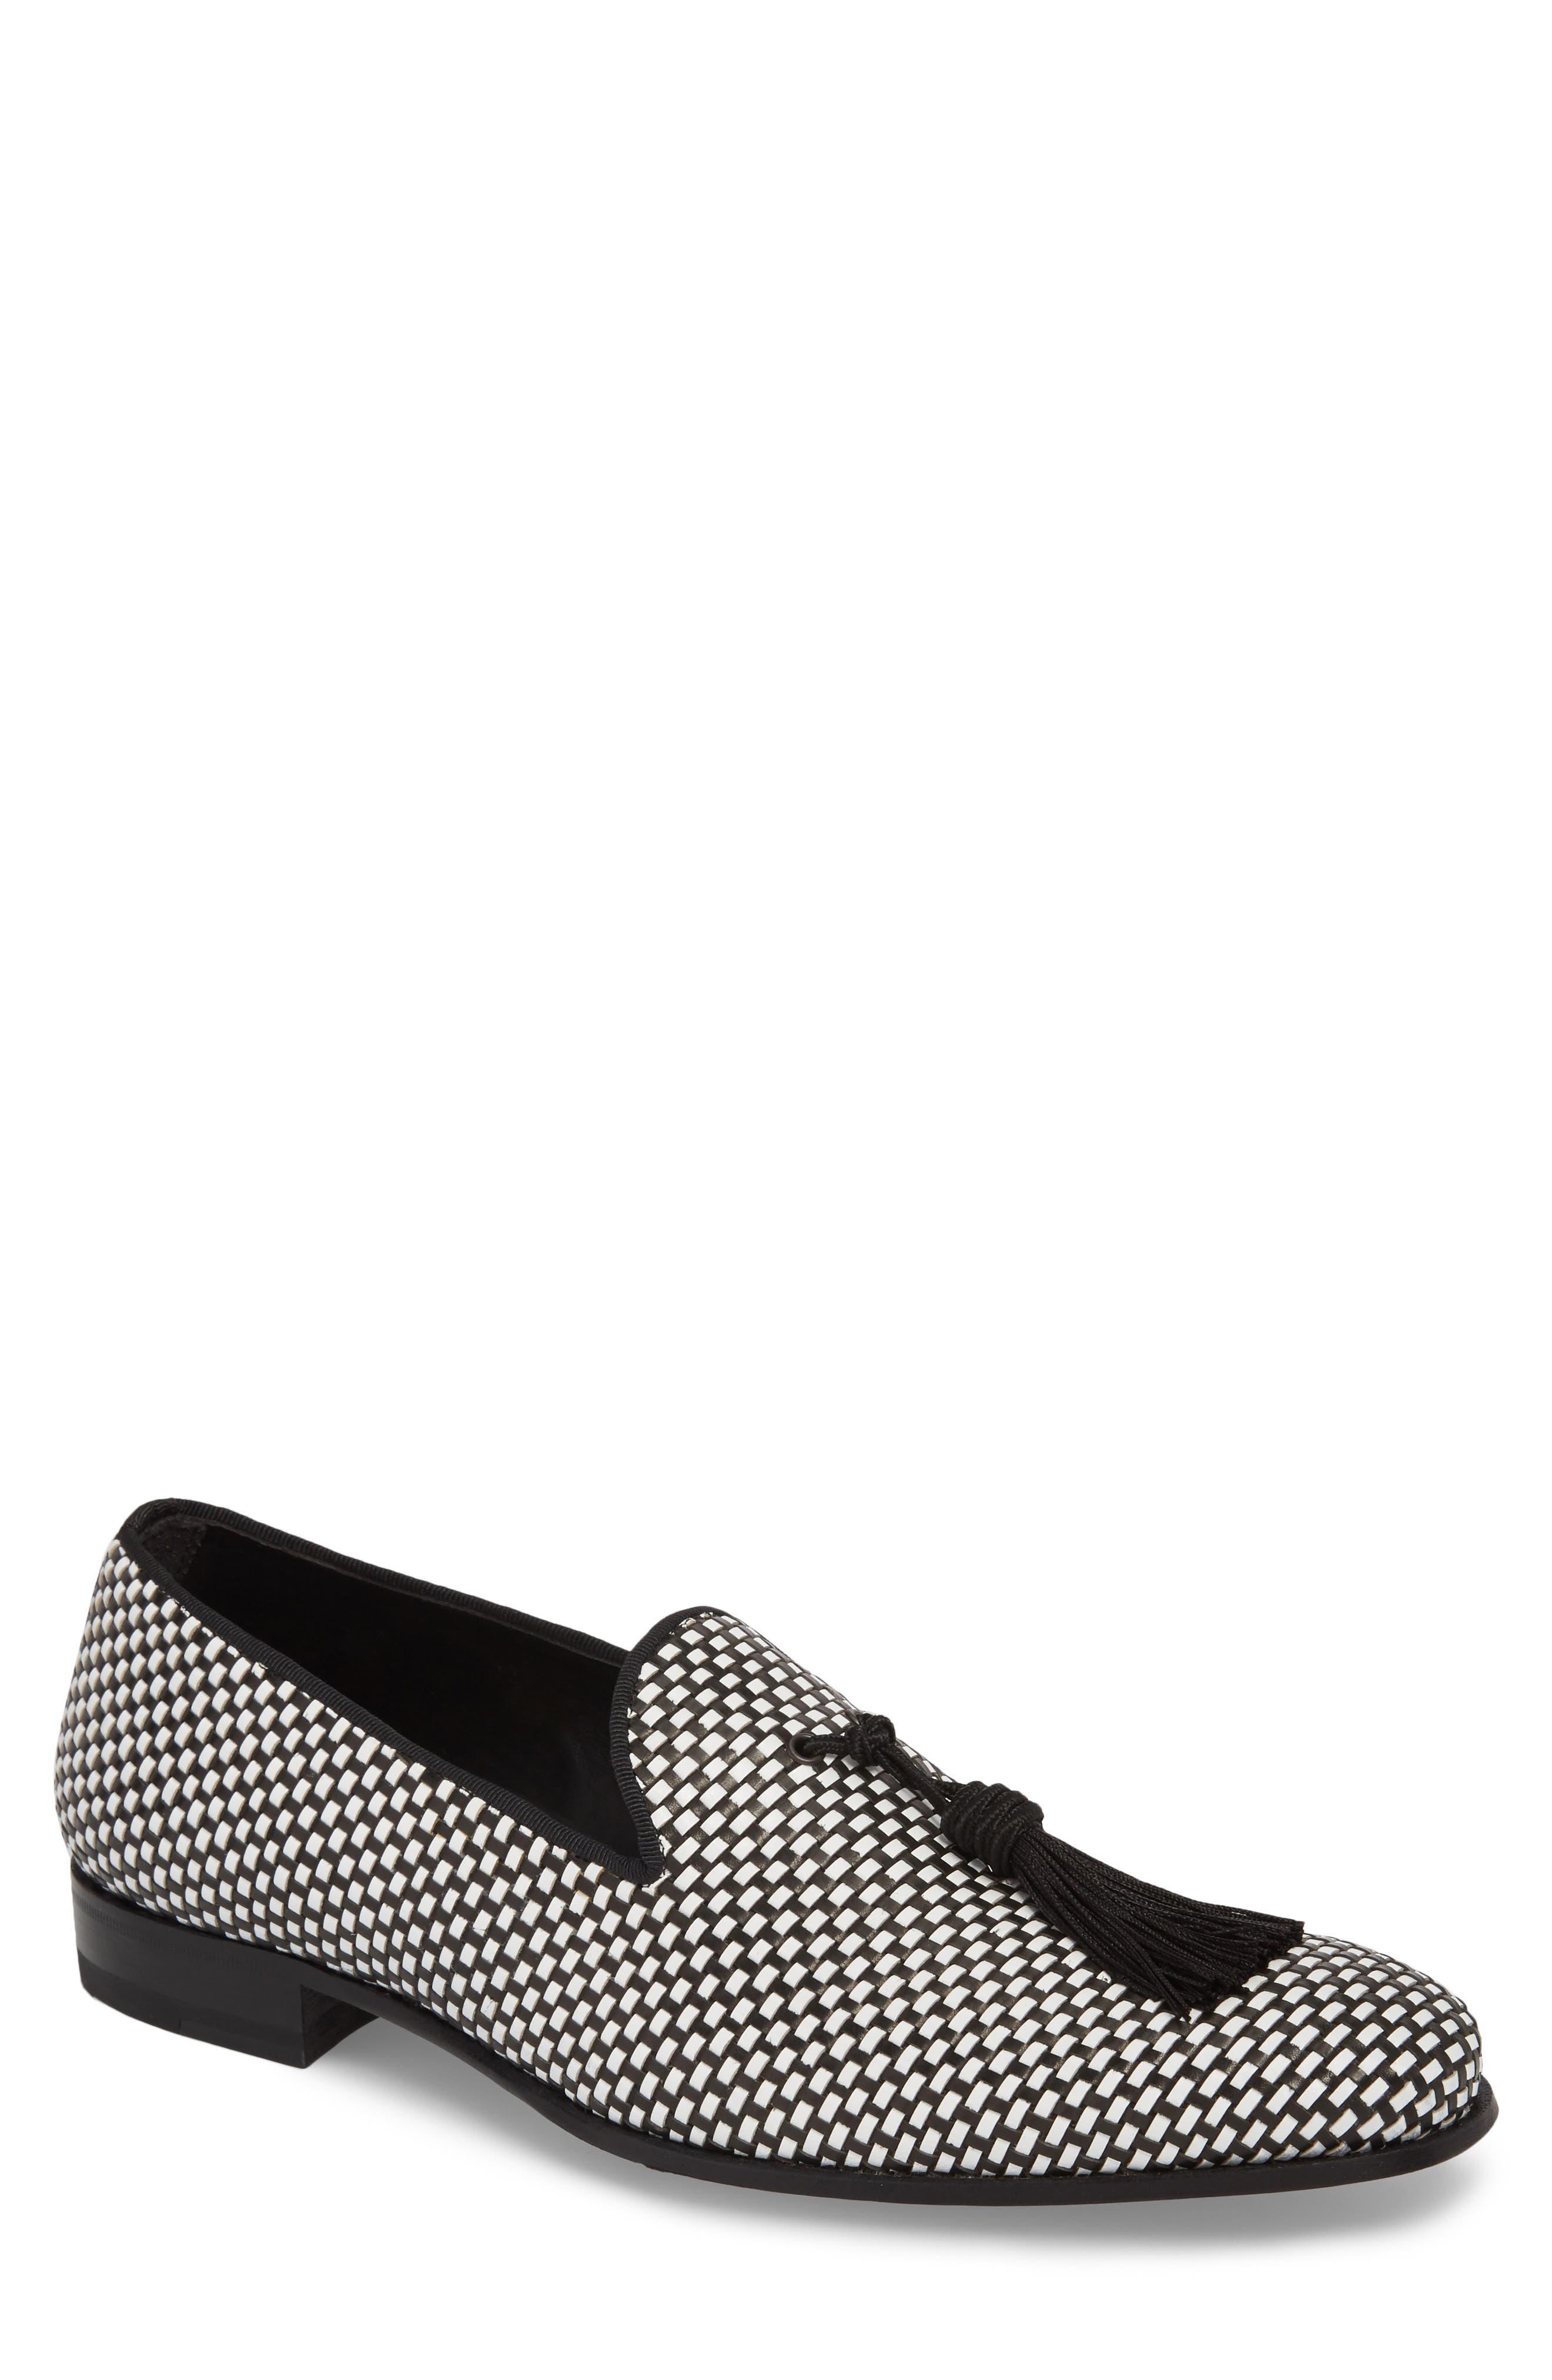 Egeo Tassel Loafer,                         Main,                         color, Black/ White Leather